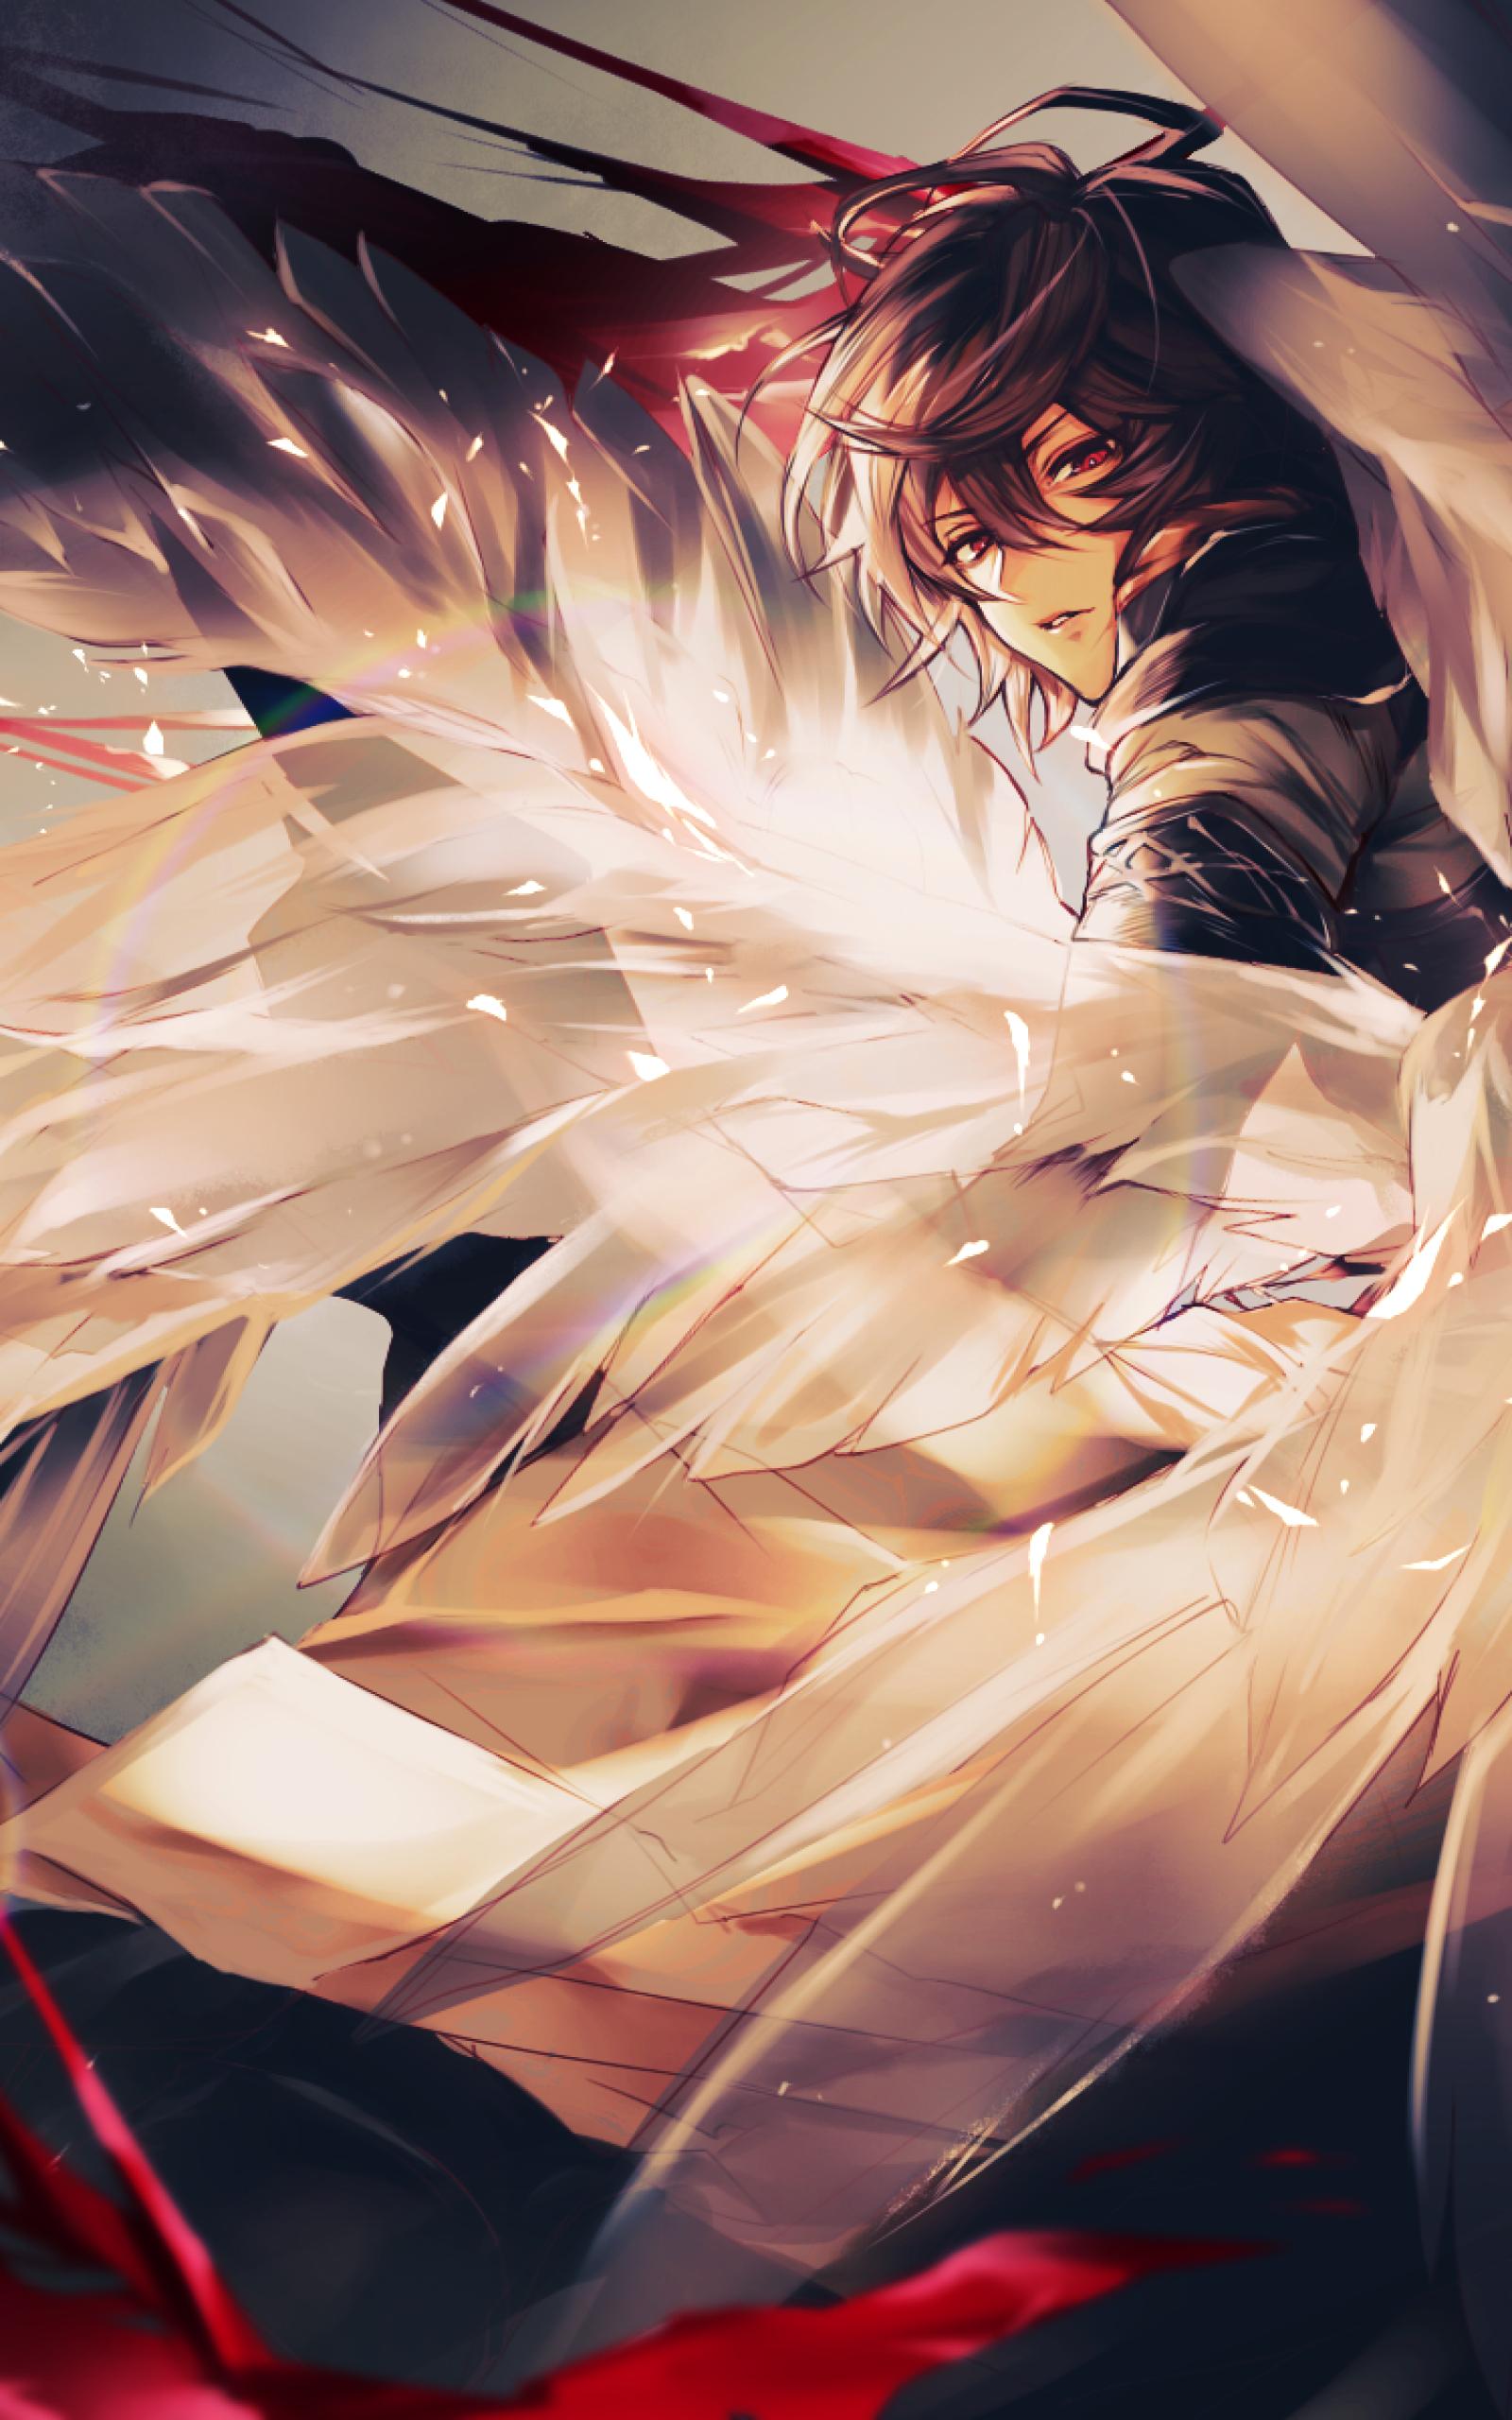 Download 1600x2560 Granblue Fantasy, Anime Games, Wings, Fallen Angel, Red Eyes ... -  Download 1600×2560 Granblue Fantasy, Anime Games, Wings, Fallen Angel, Red Eyes Wallpapers for Goo - #1600x2560 #angel #Anime #animeangel #animebun #animecosplay #animefanart #animefantasy #animehair #animeicons #animenaruto #animeprofilepicture #animesketch #animewolf #btsanime #Download #eyes #fallen #fantasy #games #granblue #los7pecadoscapitalesanime #red #Wings